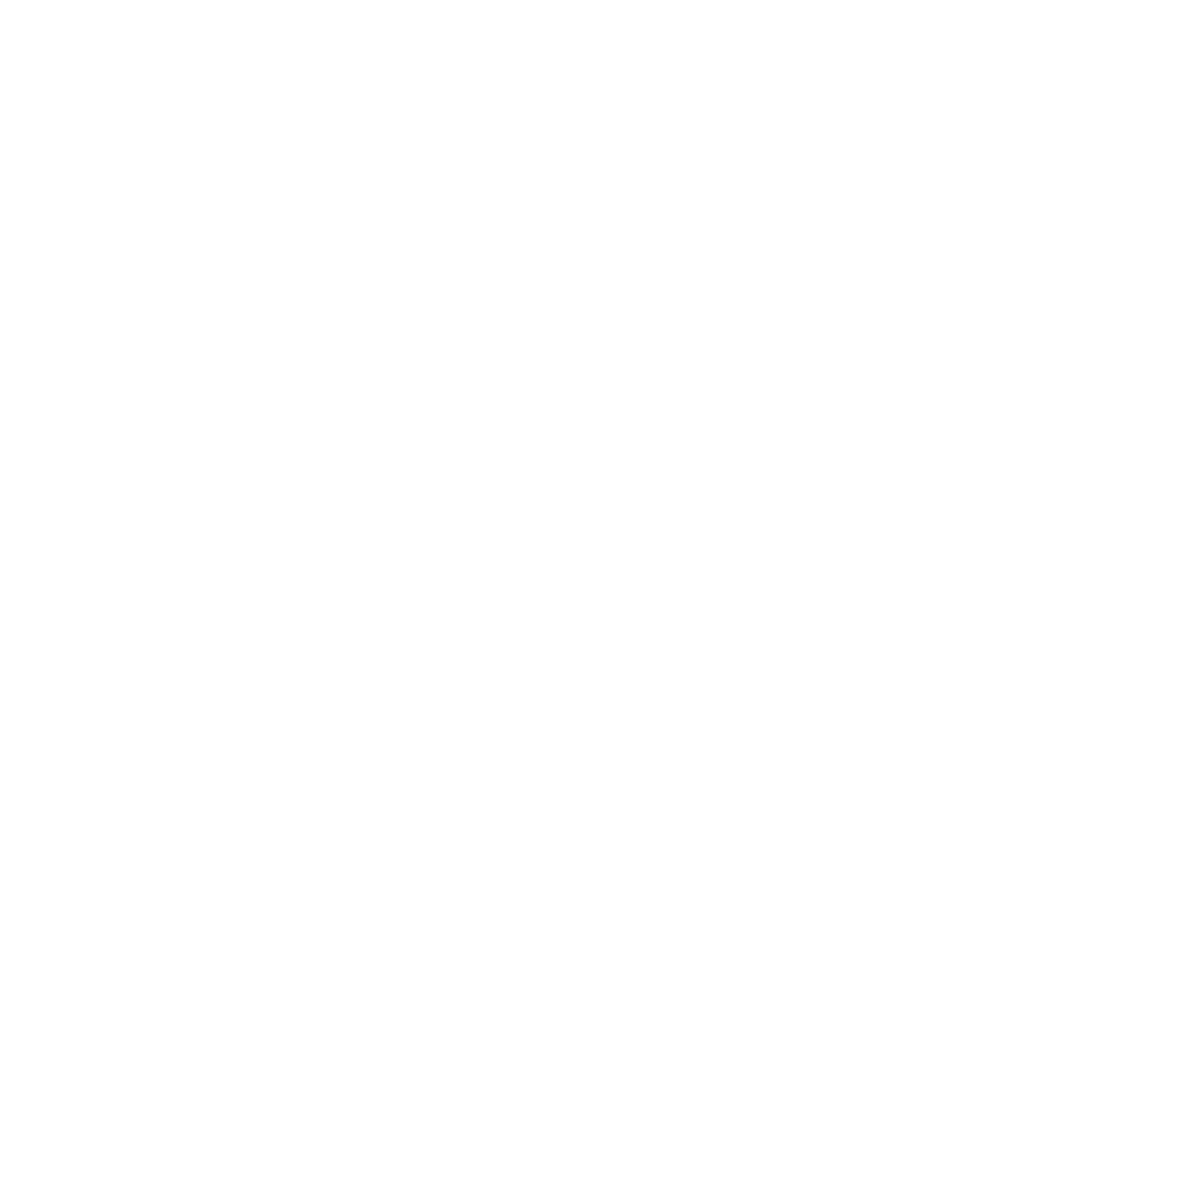 ShadowlakeLogo